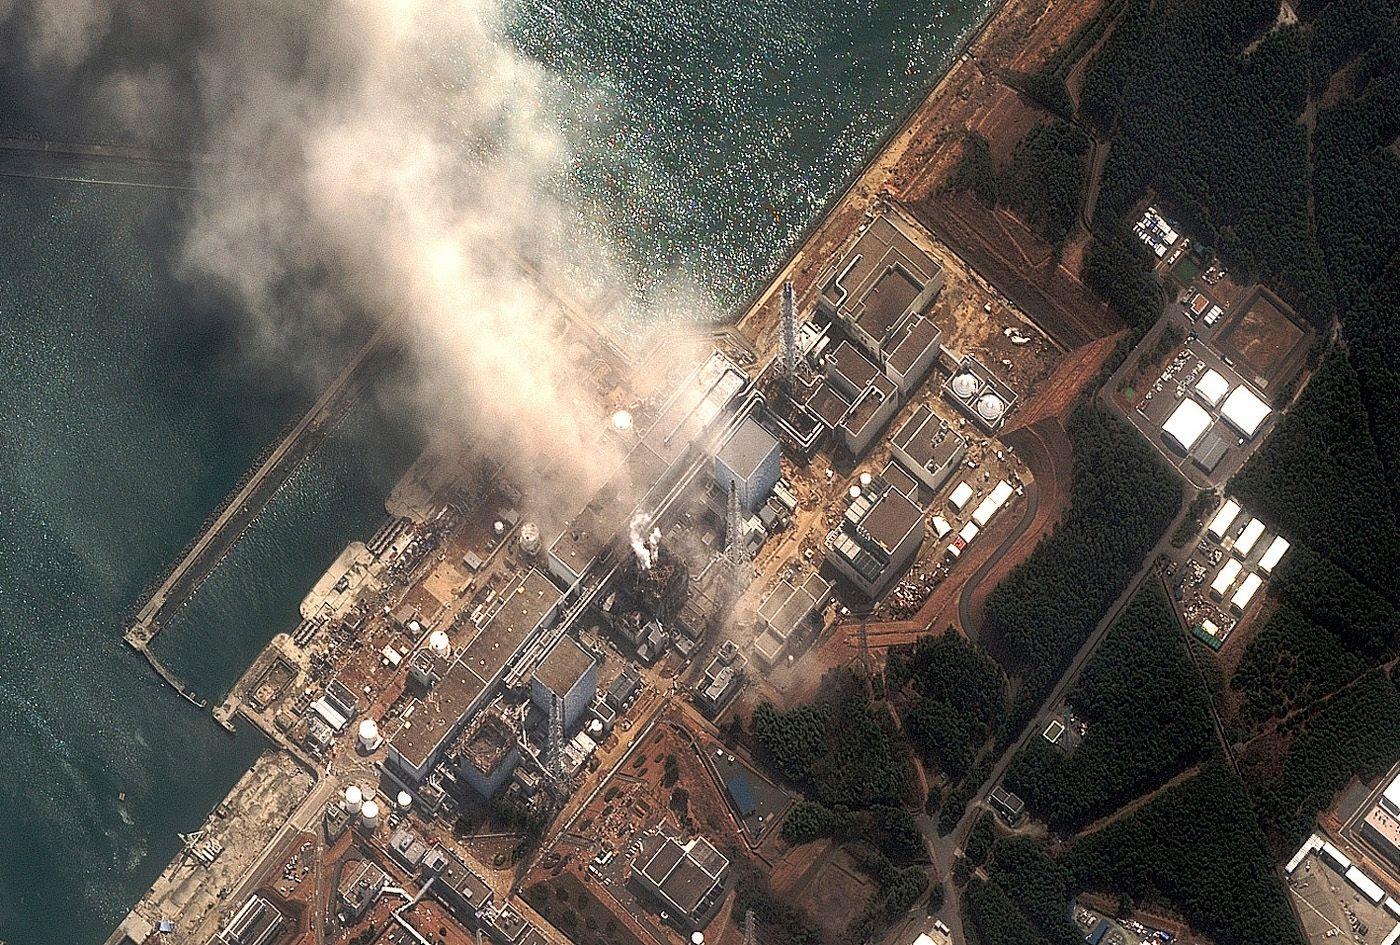 La centrale de Fukushima vue du ciel.